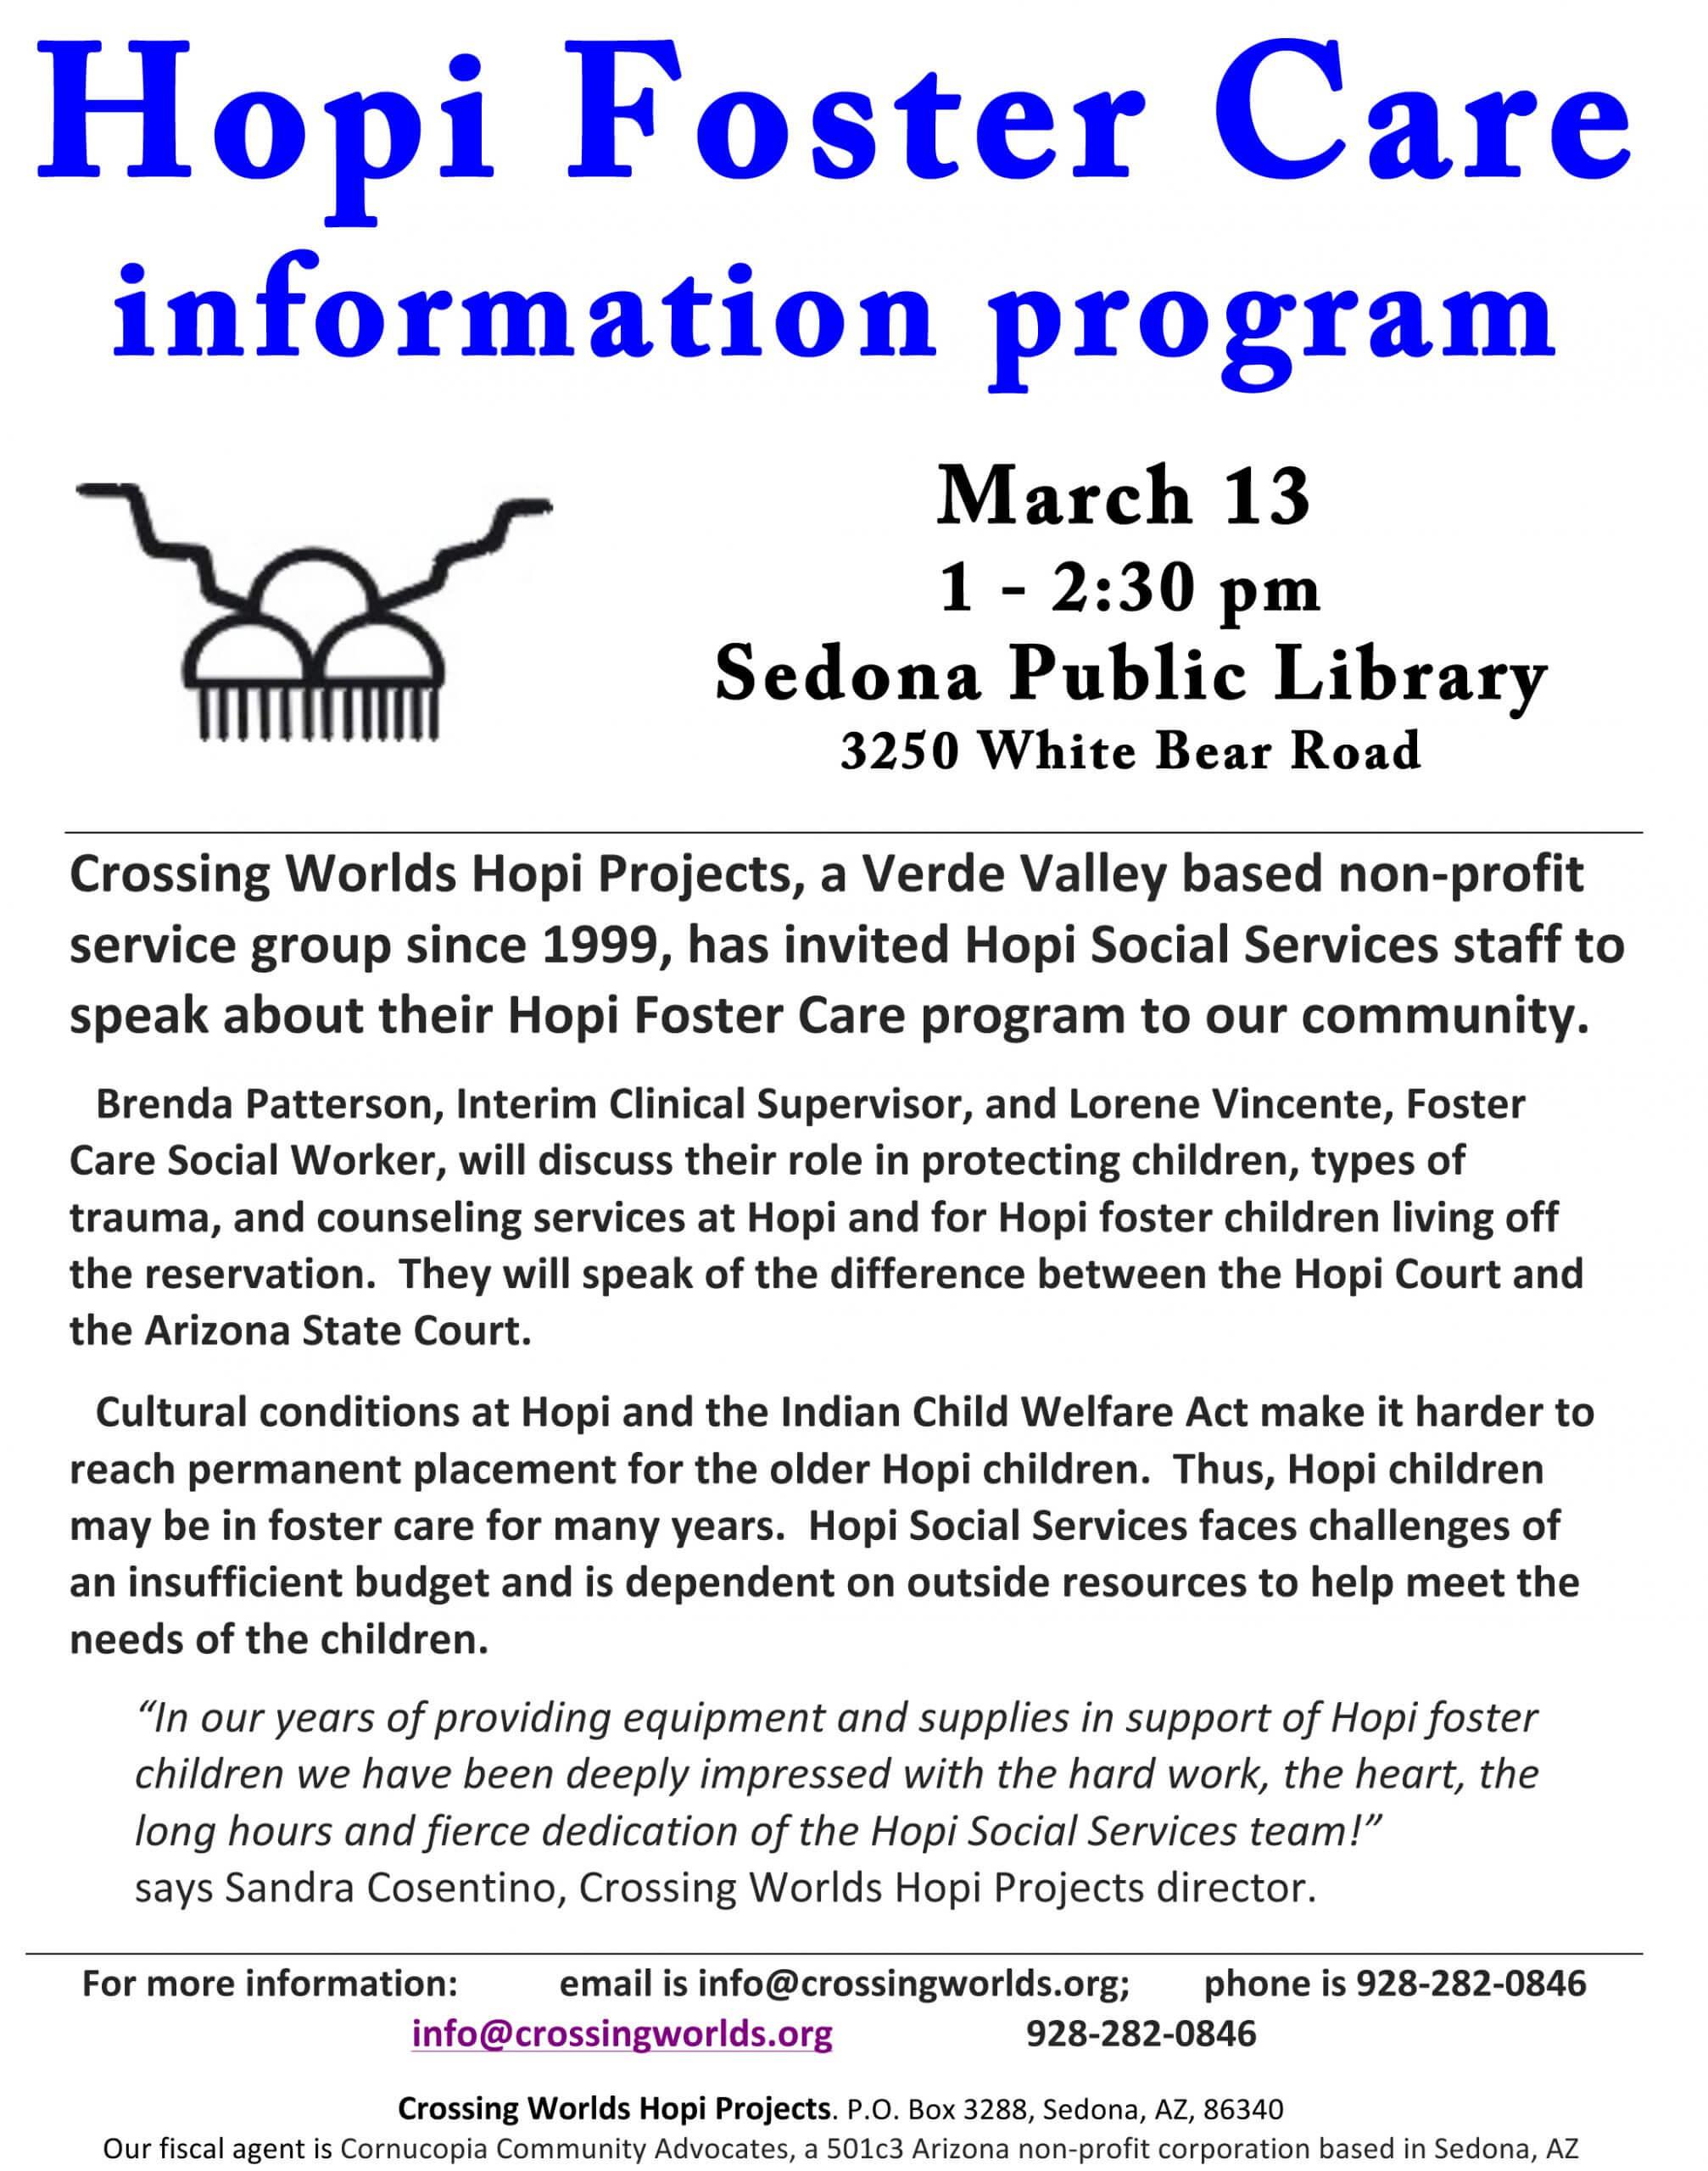 Hopi Foster Care Information Program in Sedona